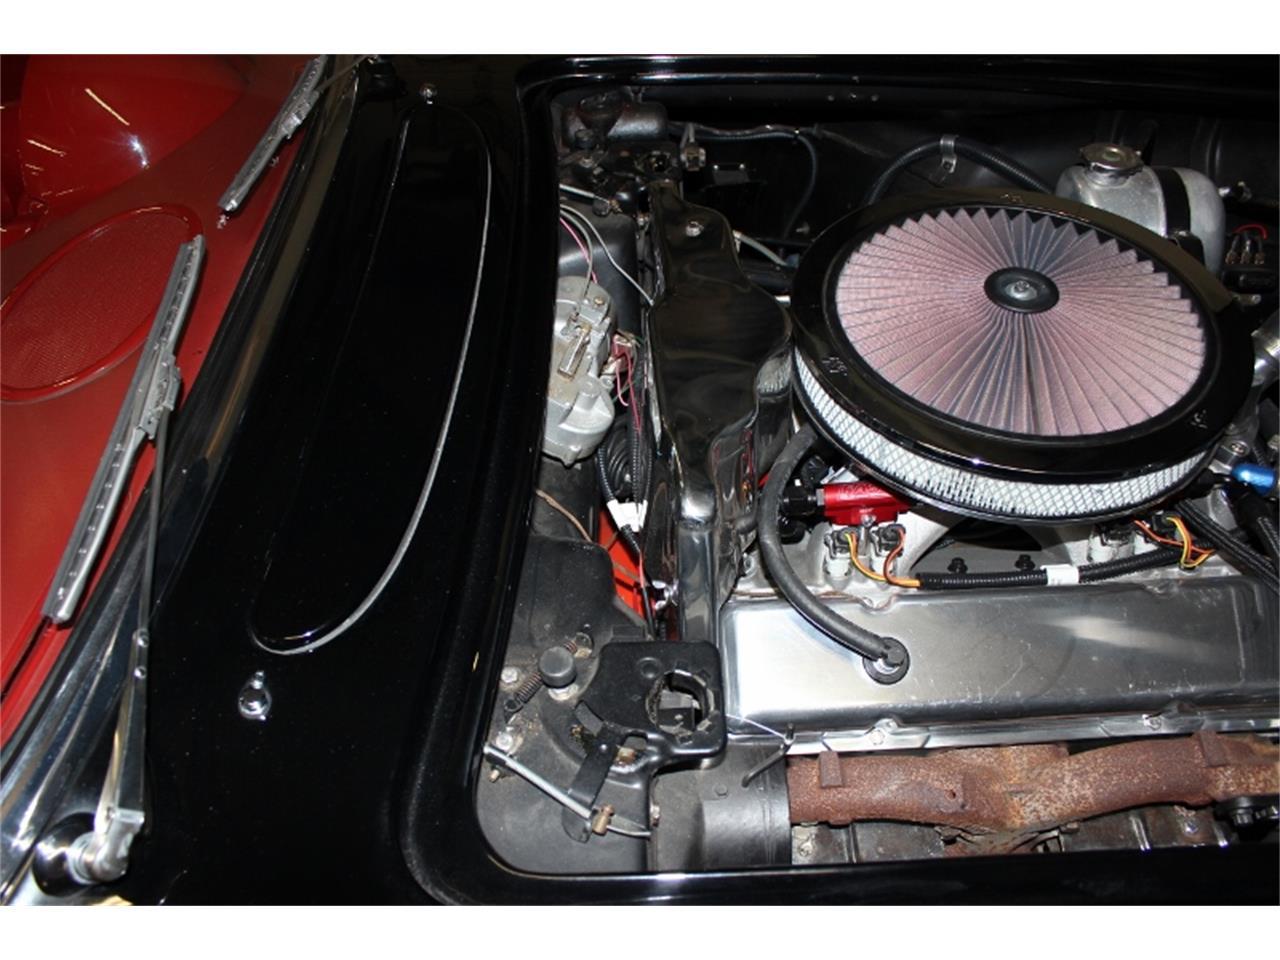 Large Picture of Classic '61 Chevrolet Corvette located in Lillington North Carolina - $90,000.00 - KT5Z